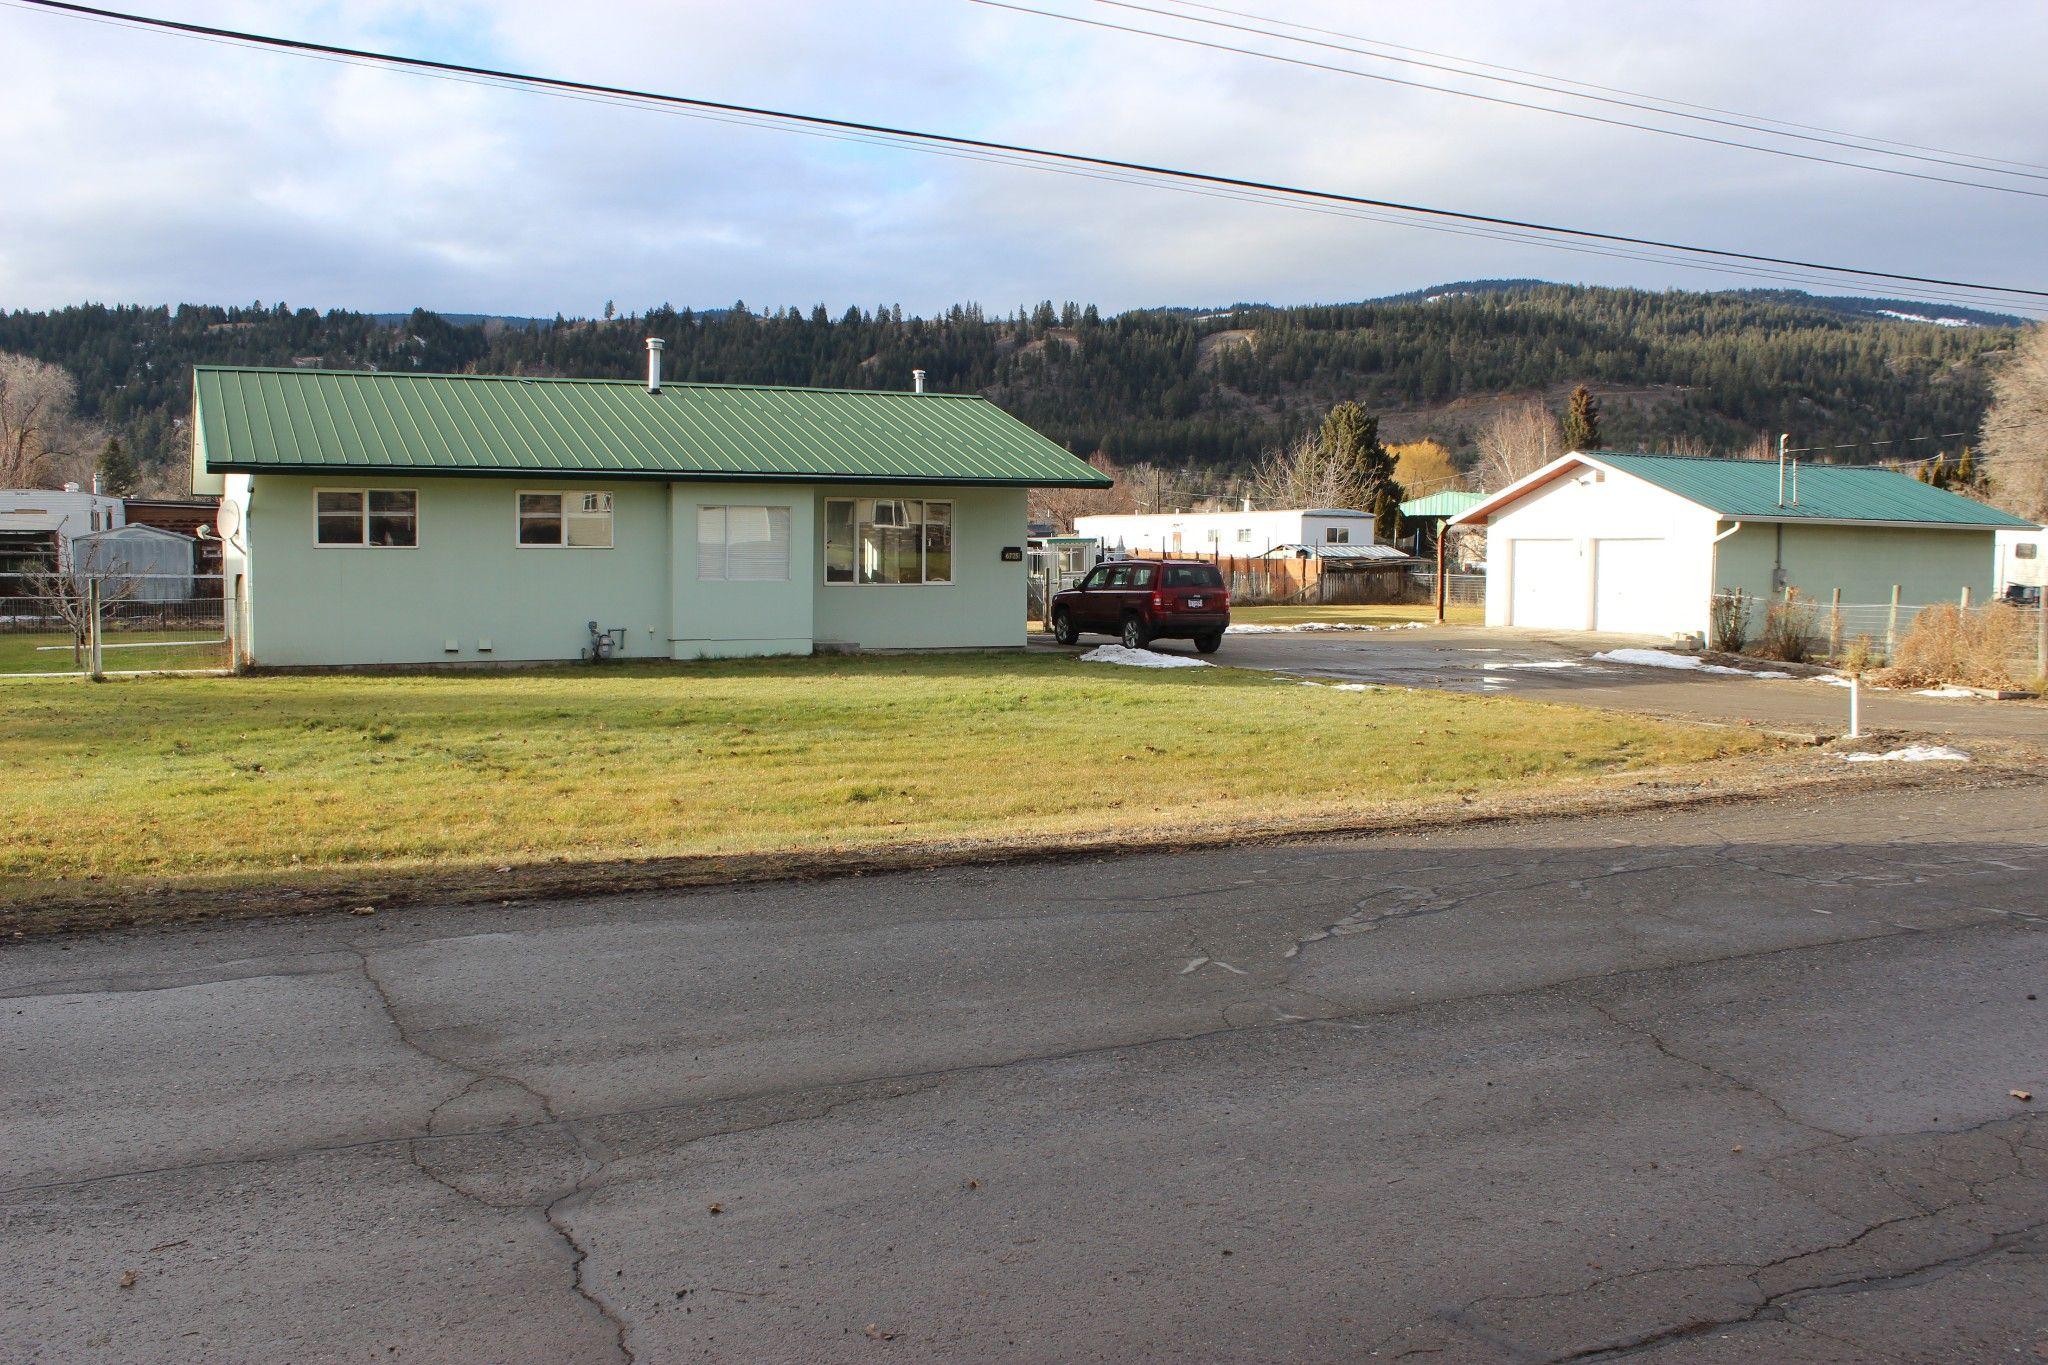 Photo 13: Photos: 6725 Heffley Road in Kamloops: Heffley House for sale : MLS®# 160007